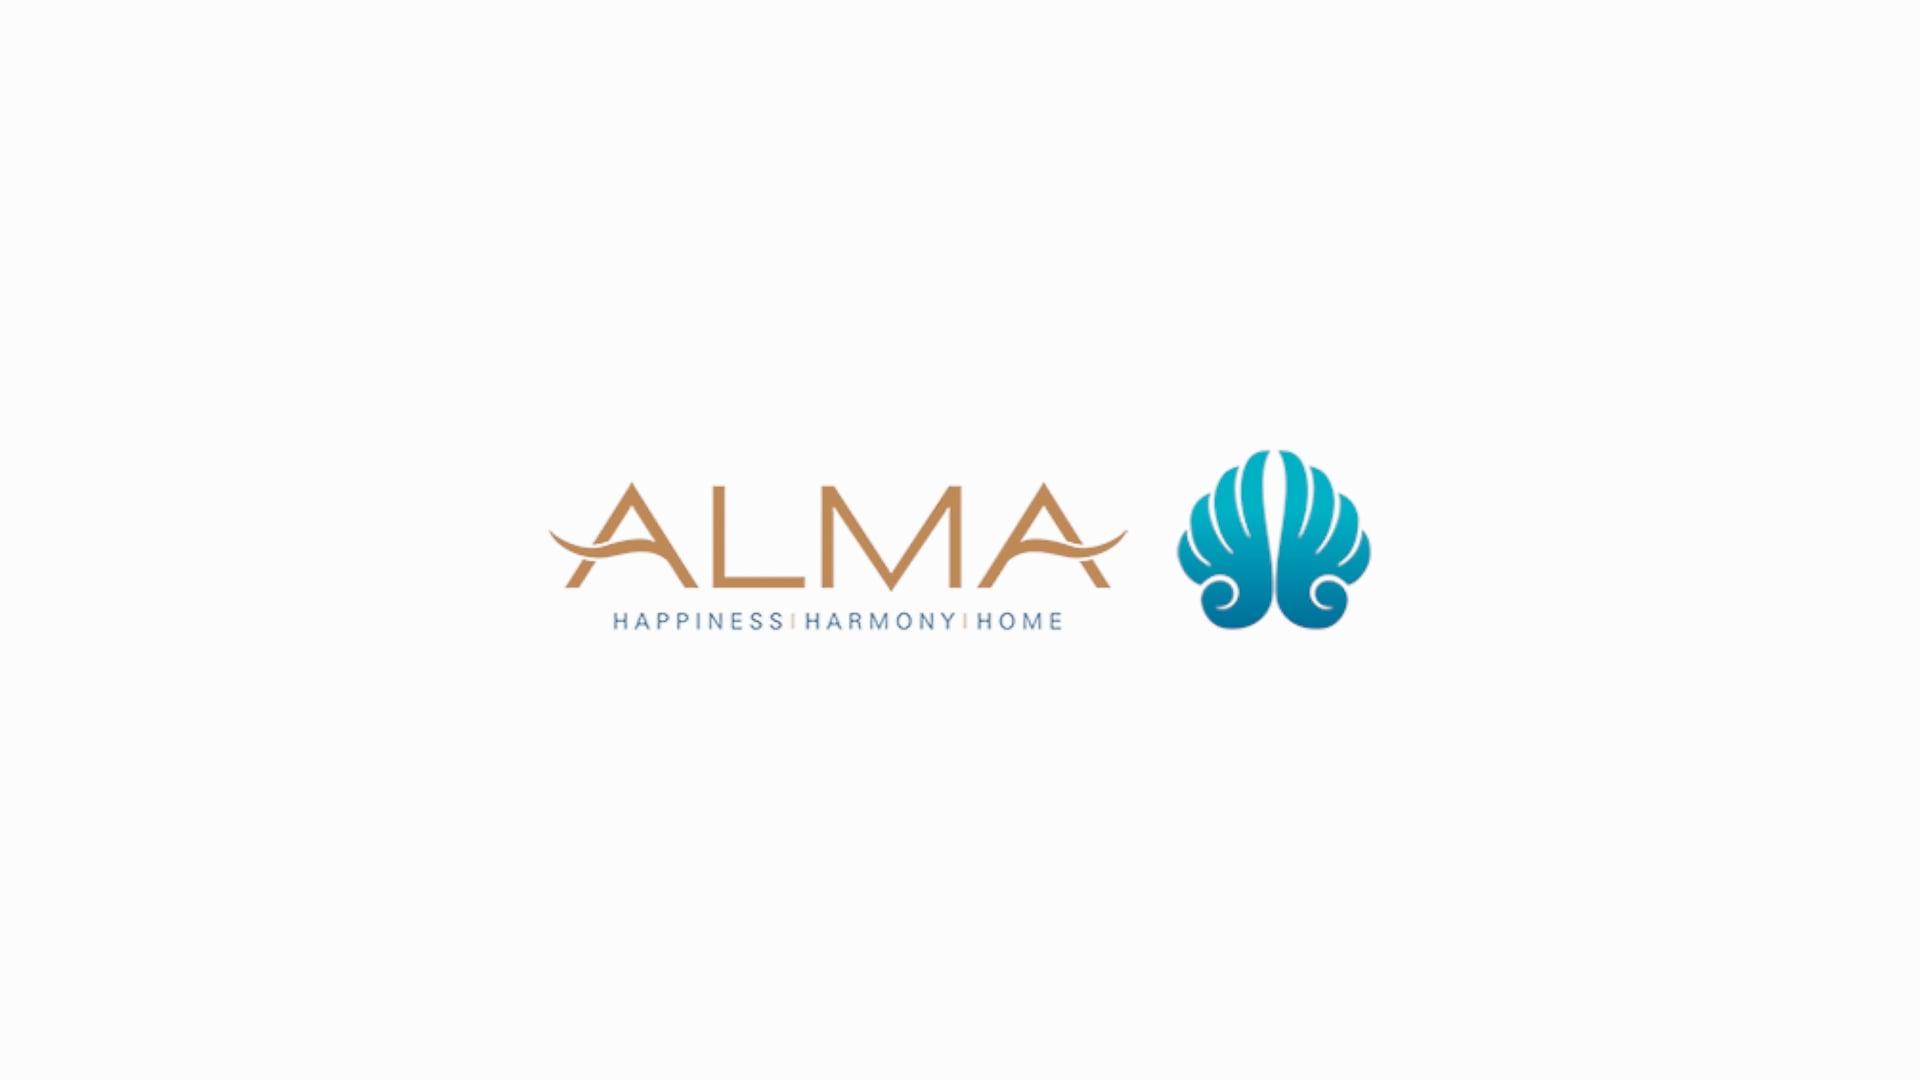 Alma Resort (Hotel Promotional Video)